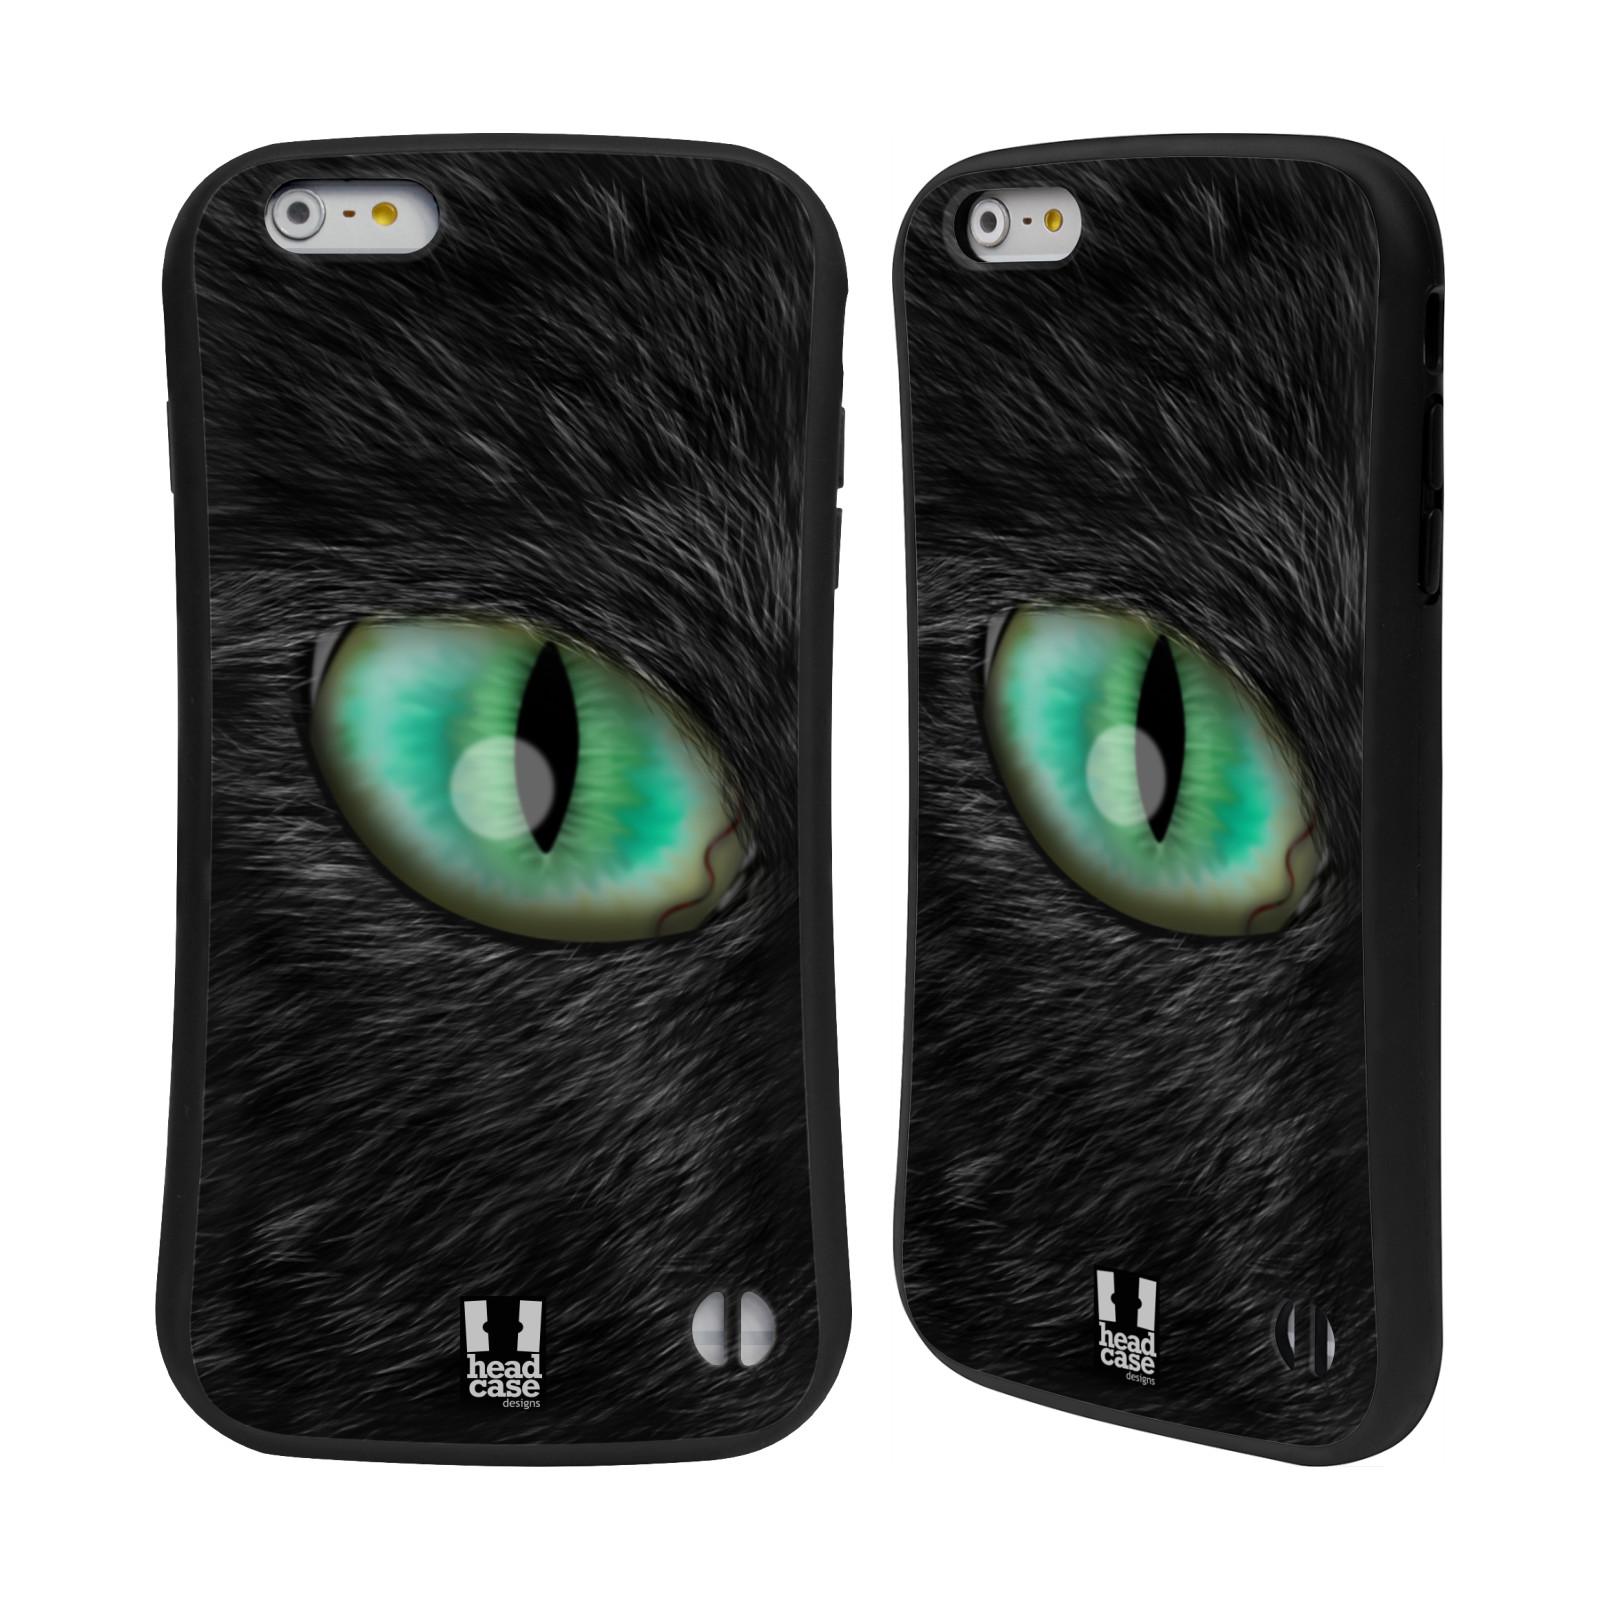 HEAD CASE silikon/plast odolný obal na mobil Apple Iphone 6 PLUS / 6S PLUS vzor pohled zvířete oko kočka